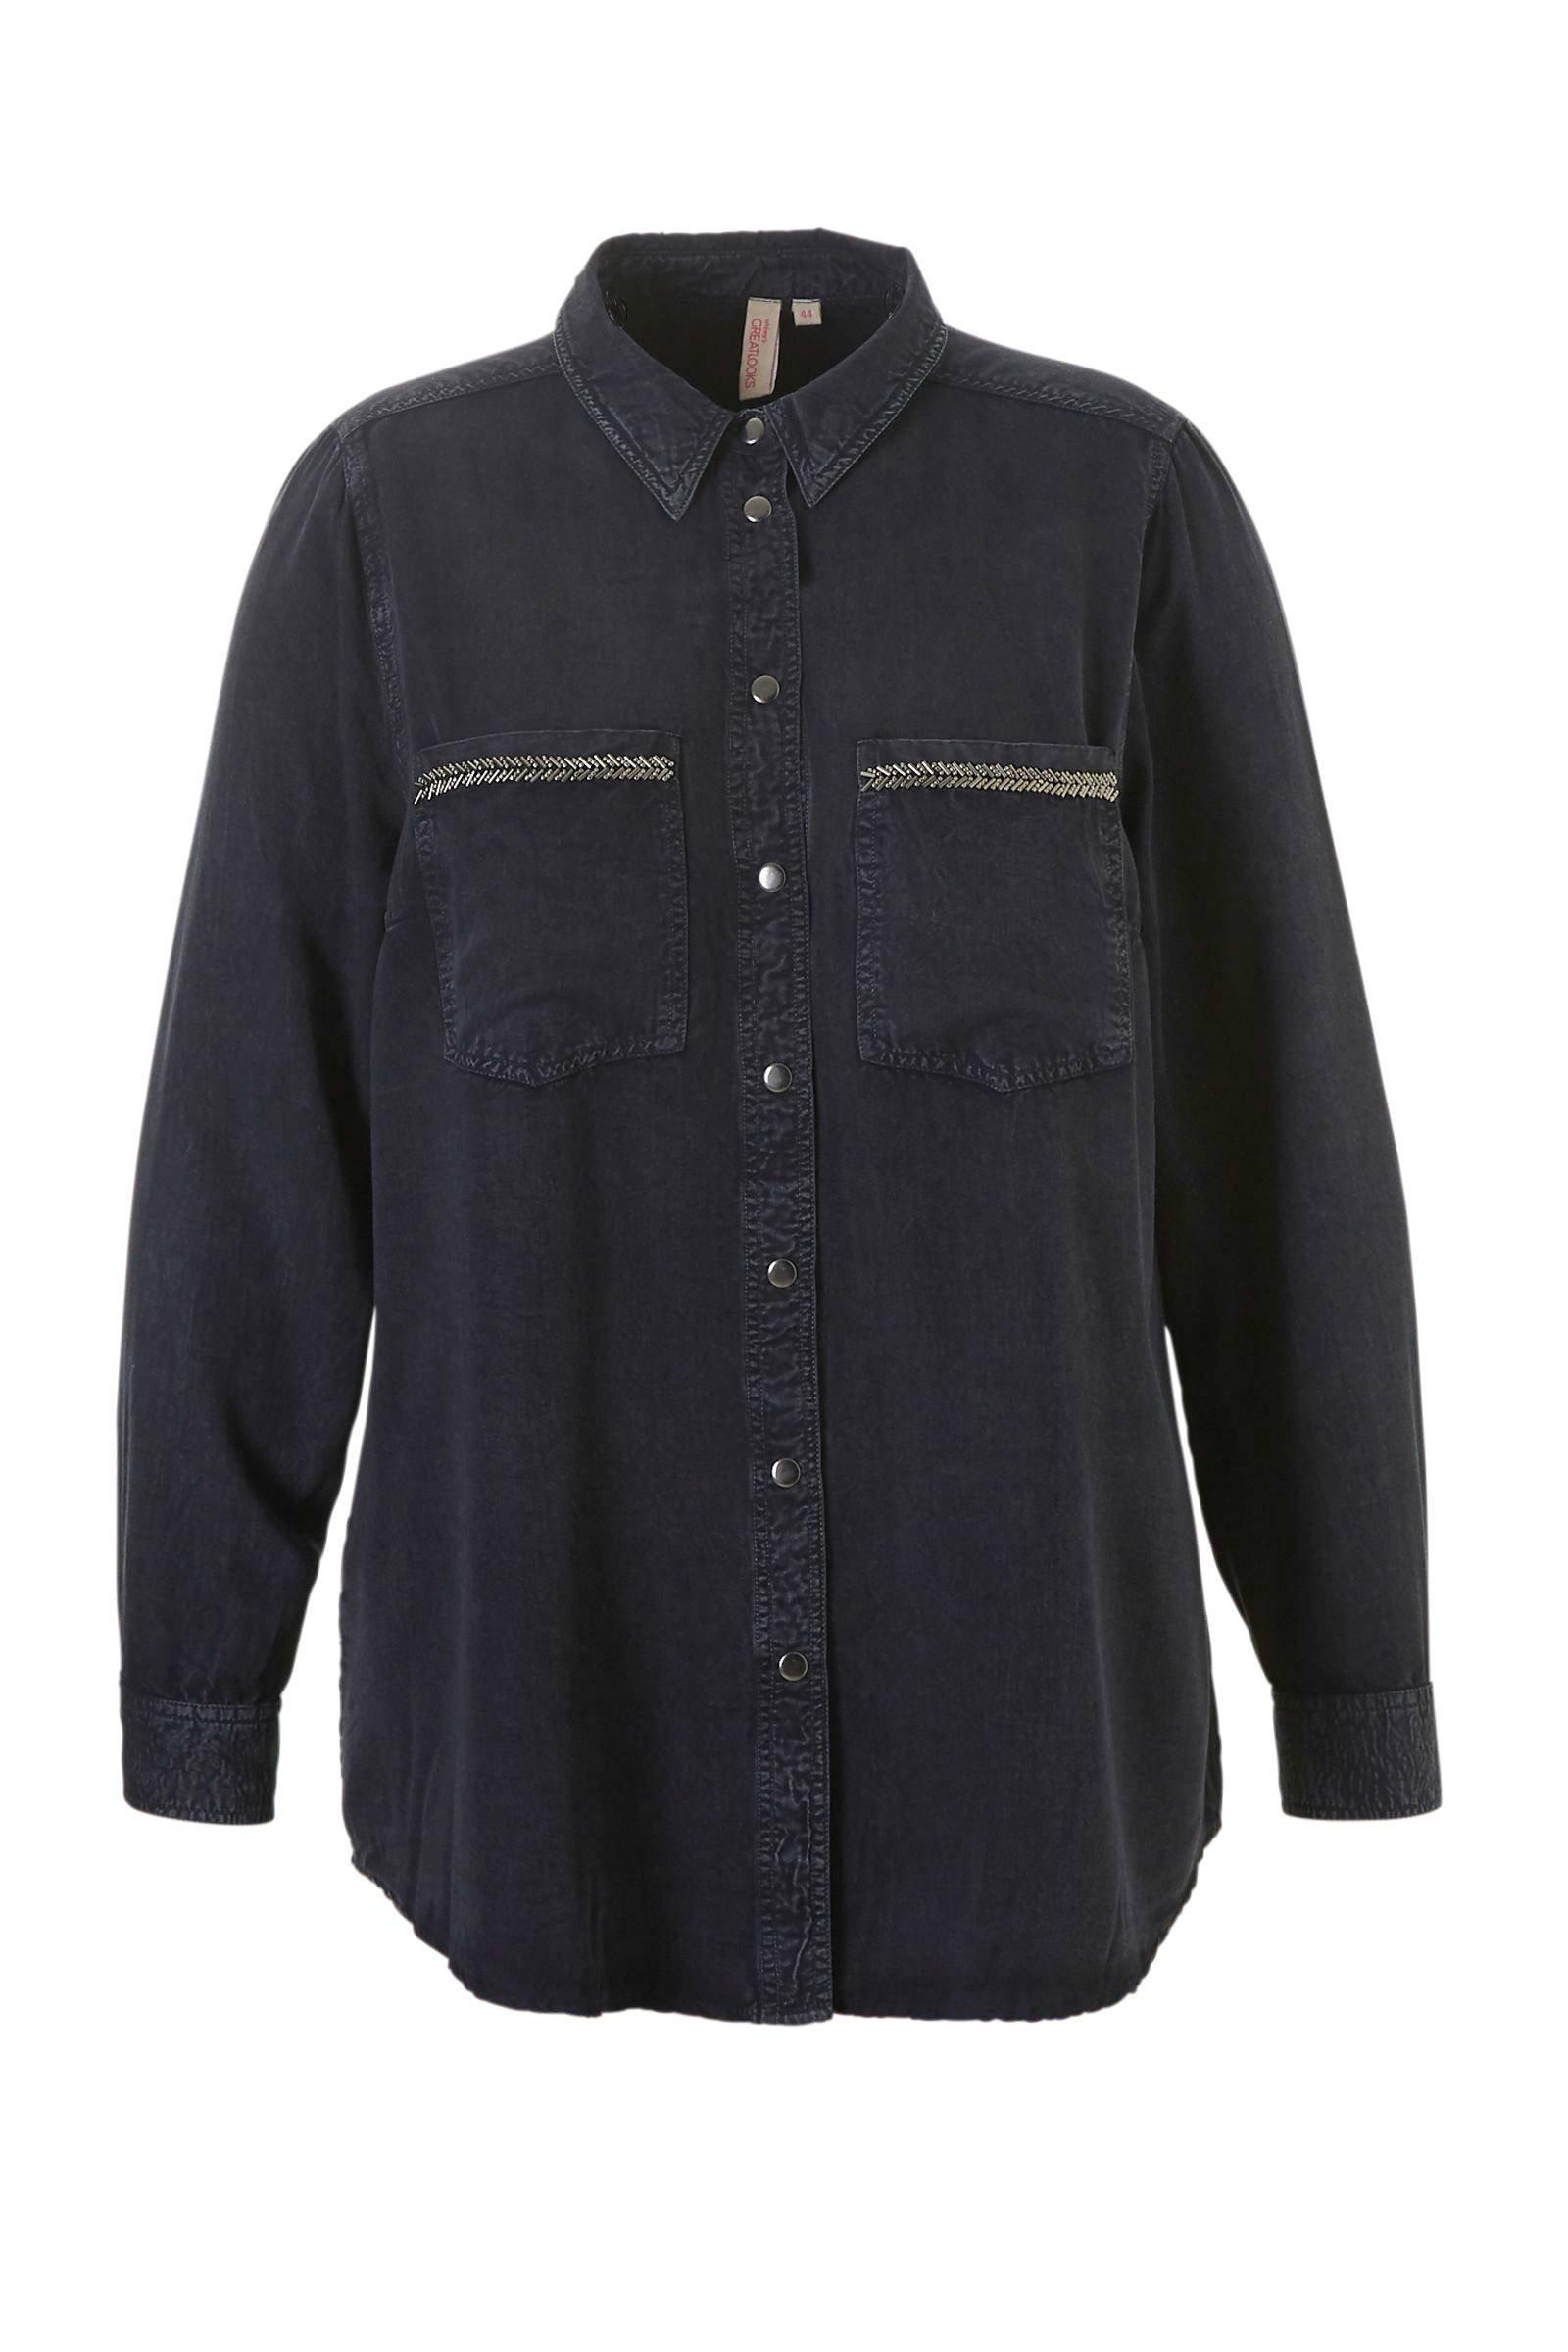 whkmp's great looks blouse met kraaltjes (dames)